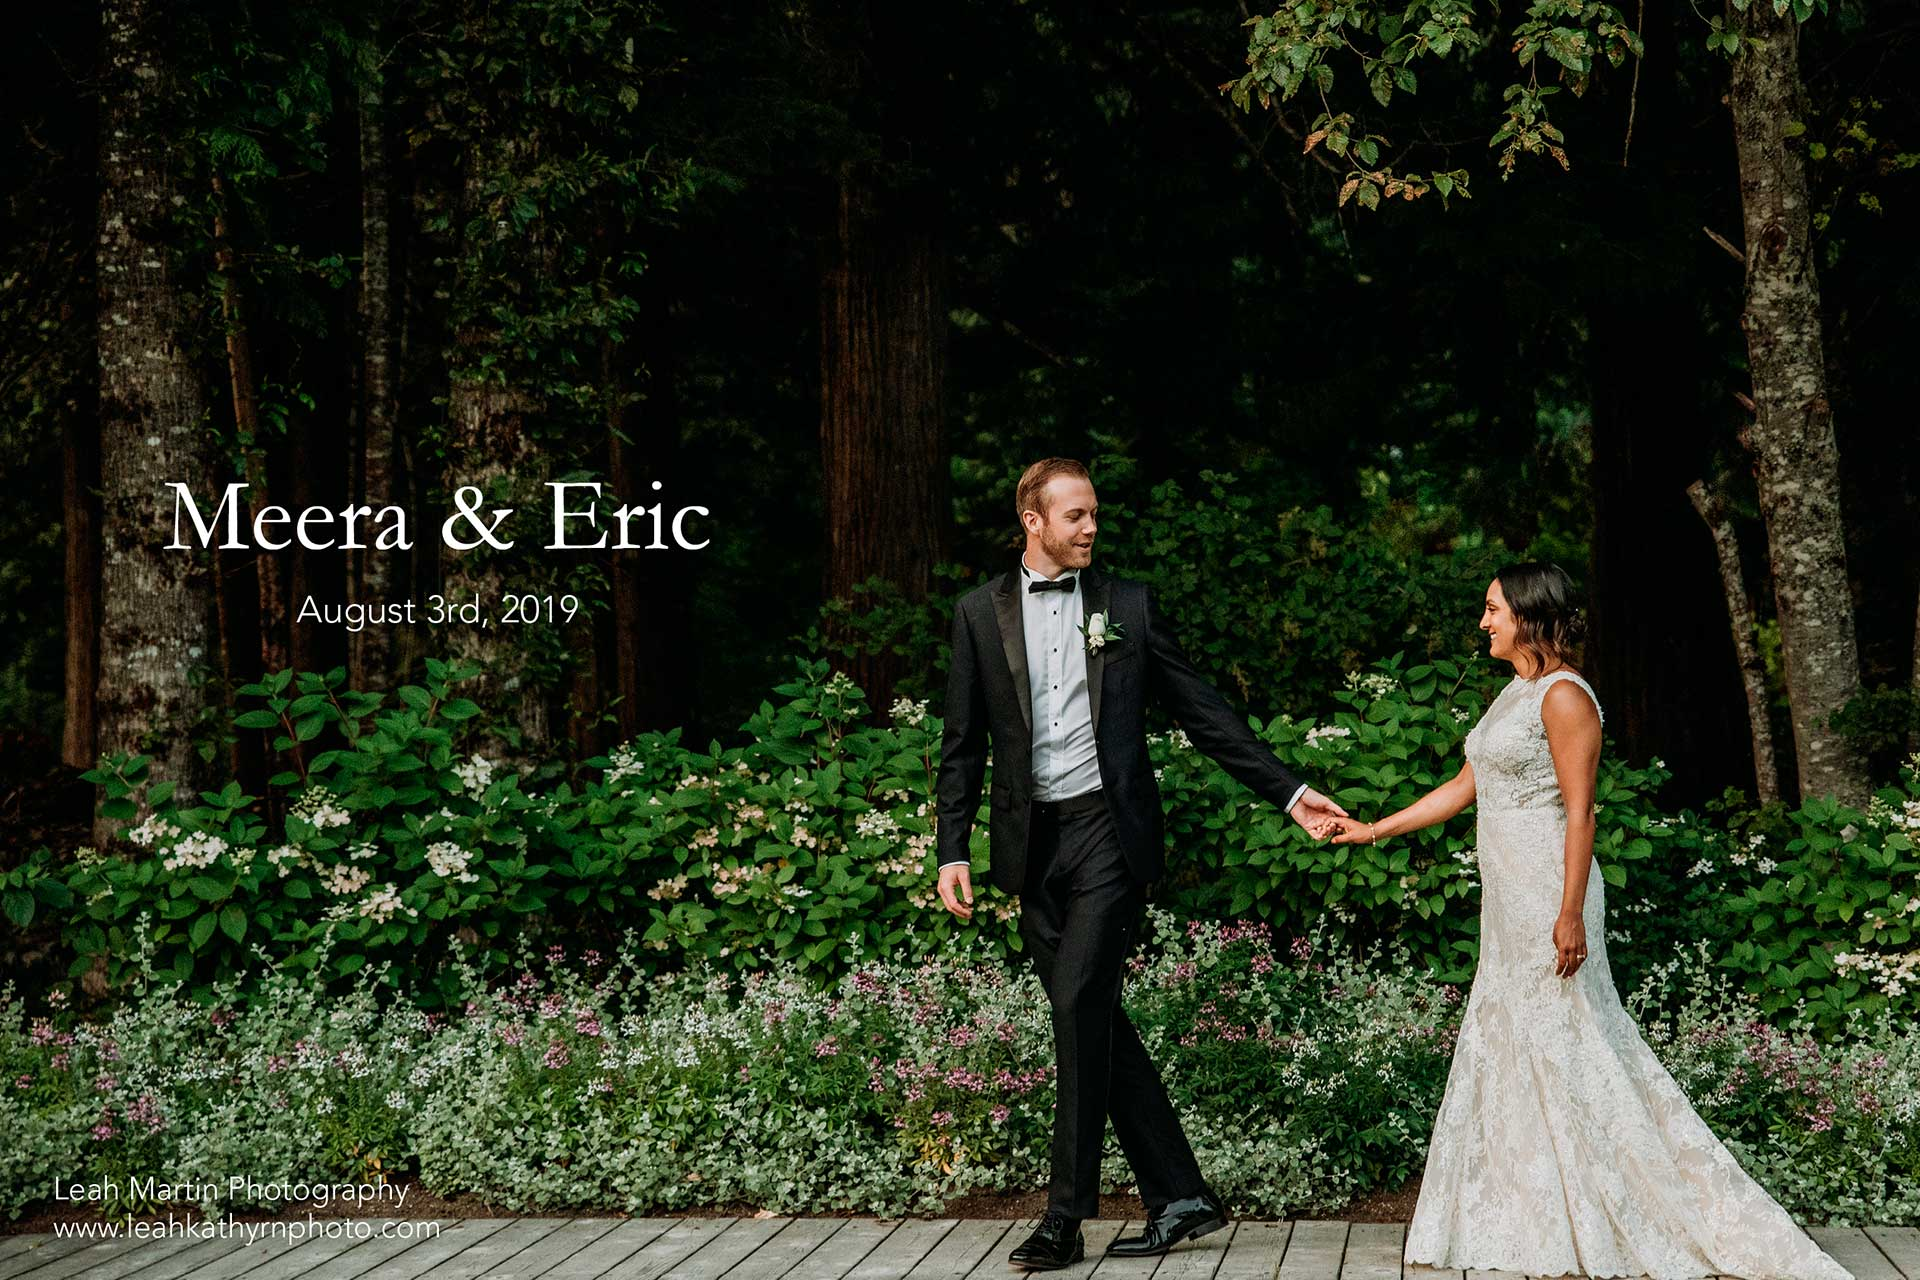 Meera and Eric's Wedding